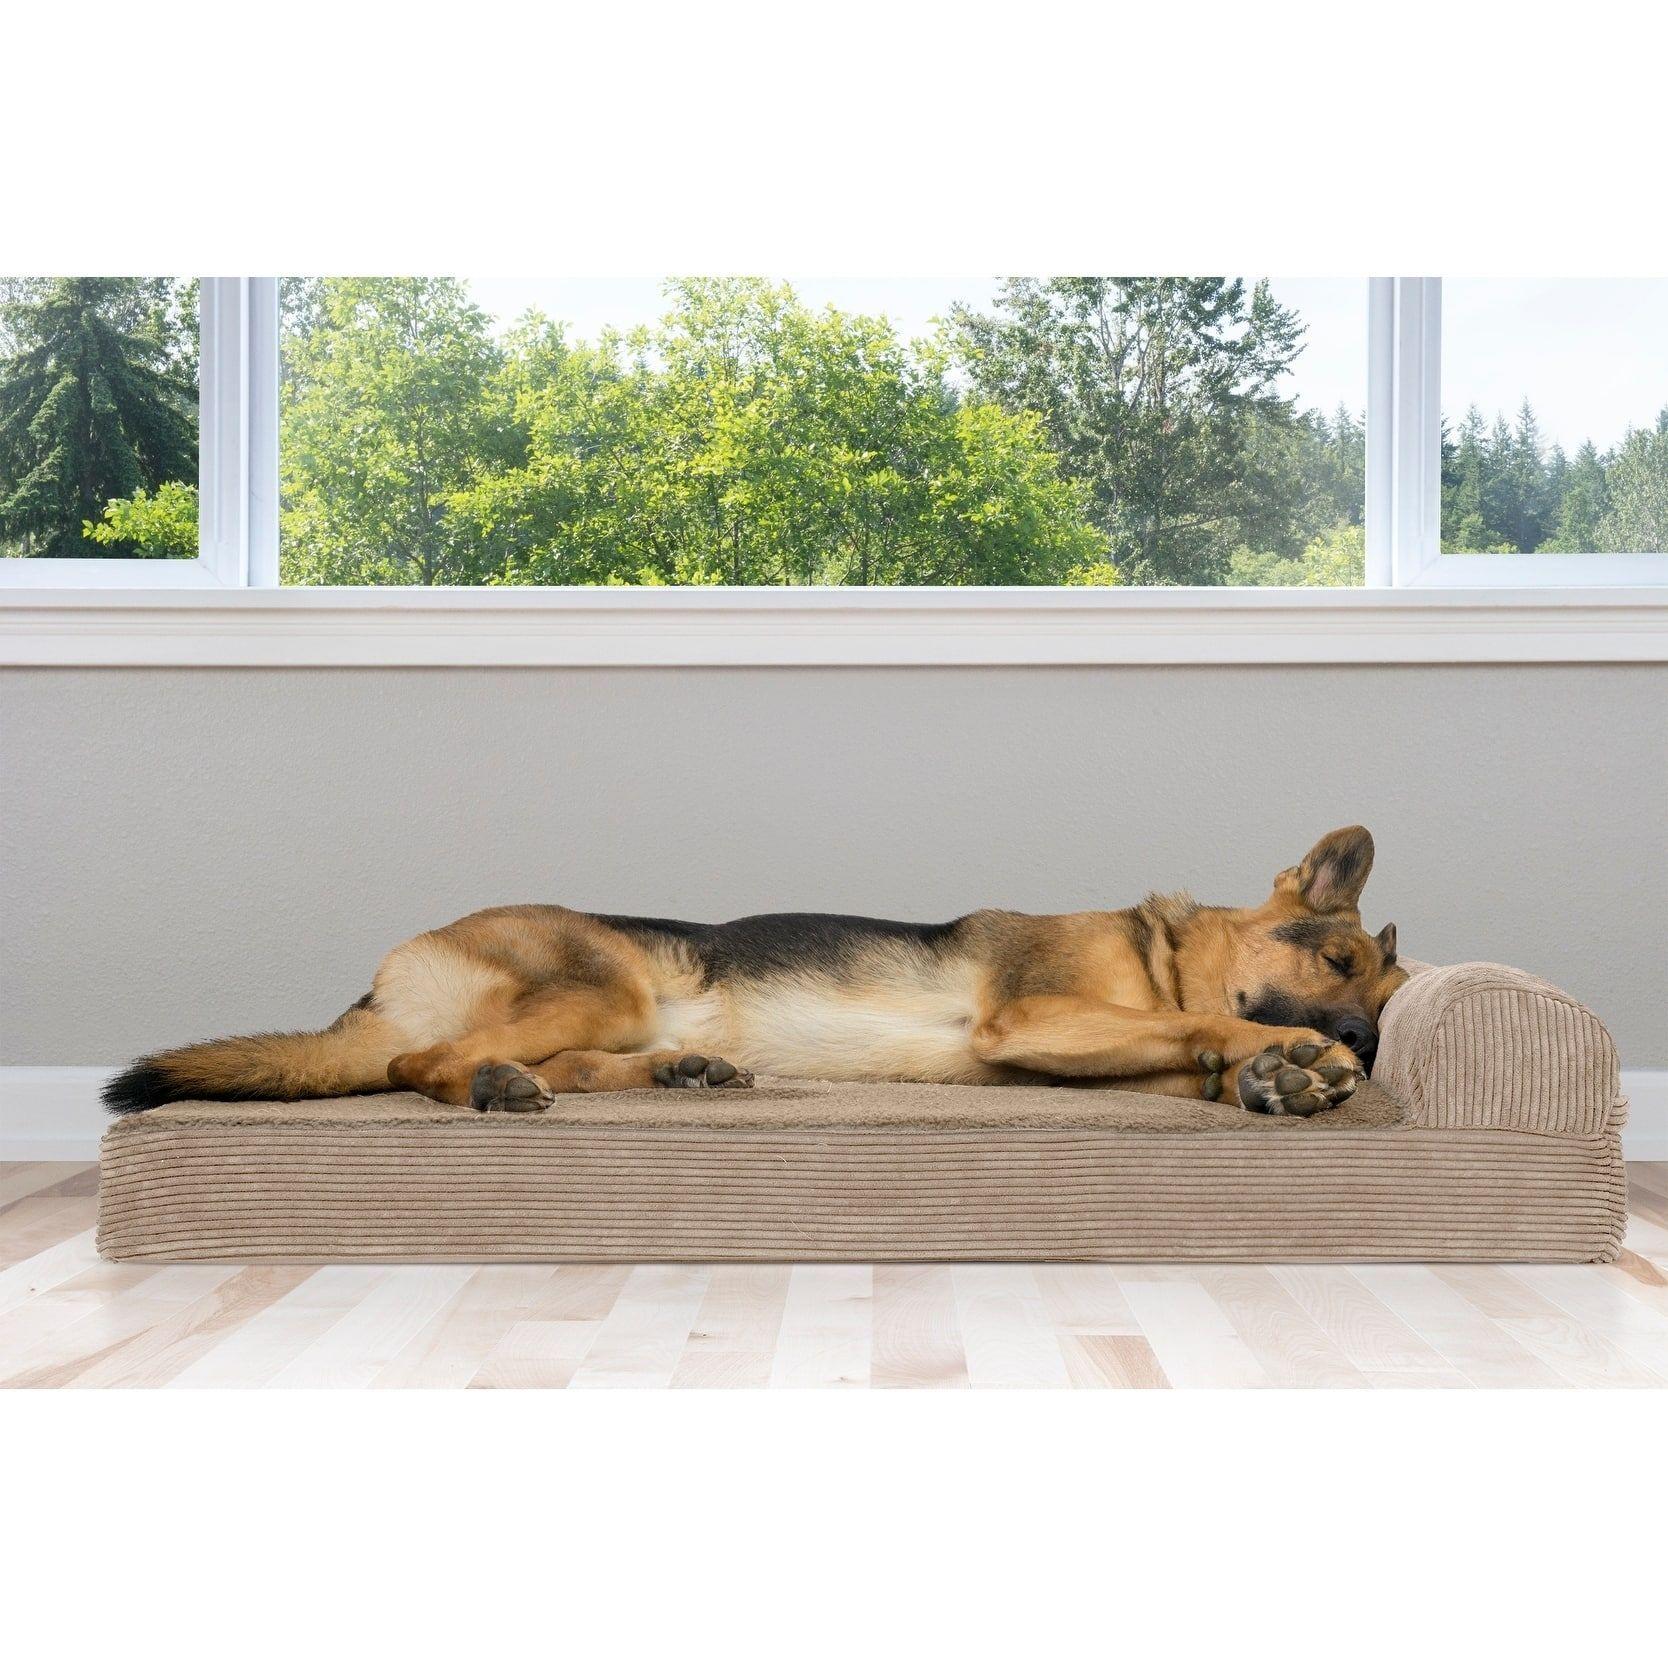 FurHaven Pet Bed | Faux Fleece & Corduroy Chaise Lounge Orthopedic Sofa Dog Bed